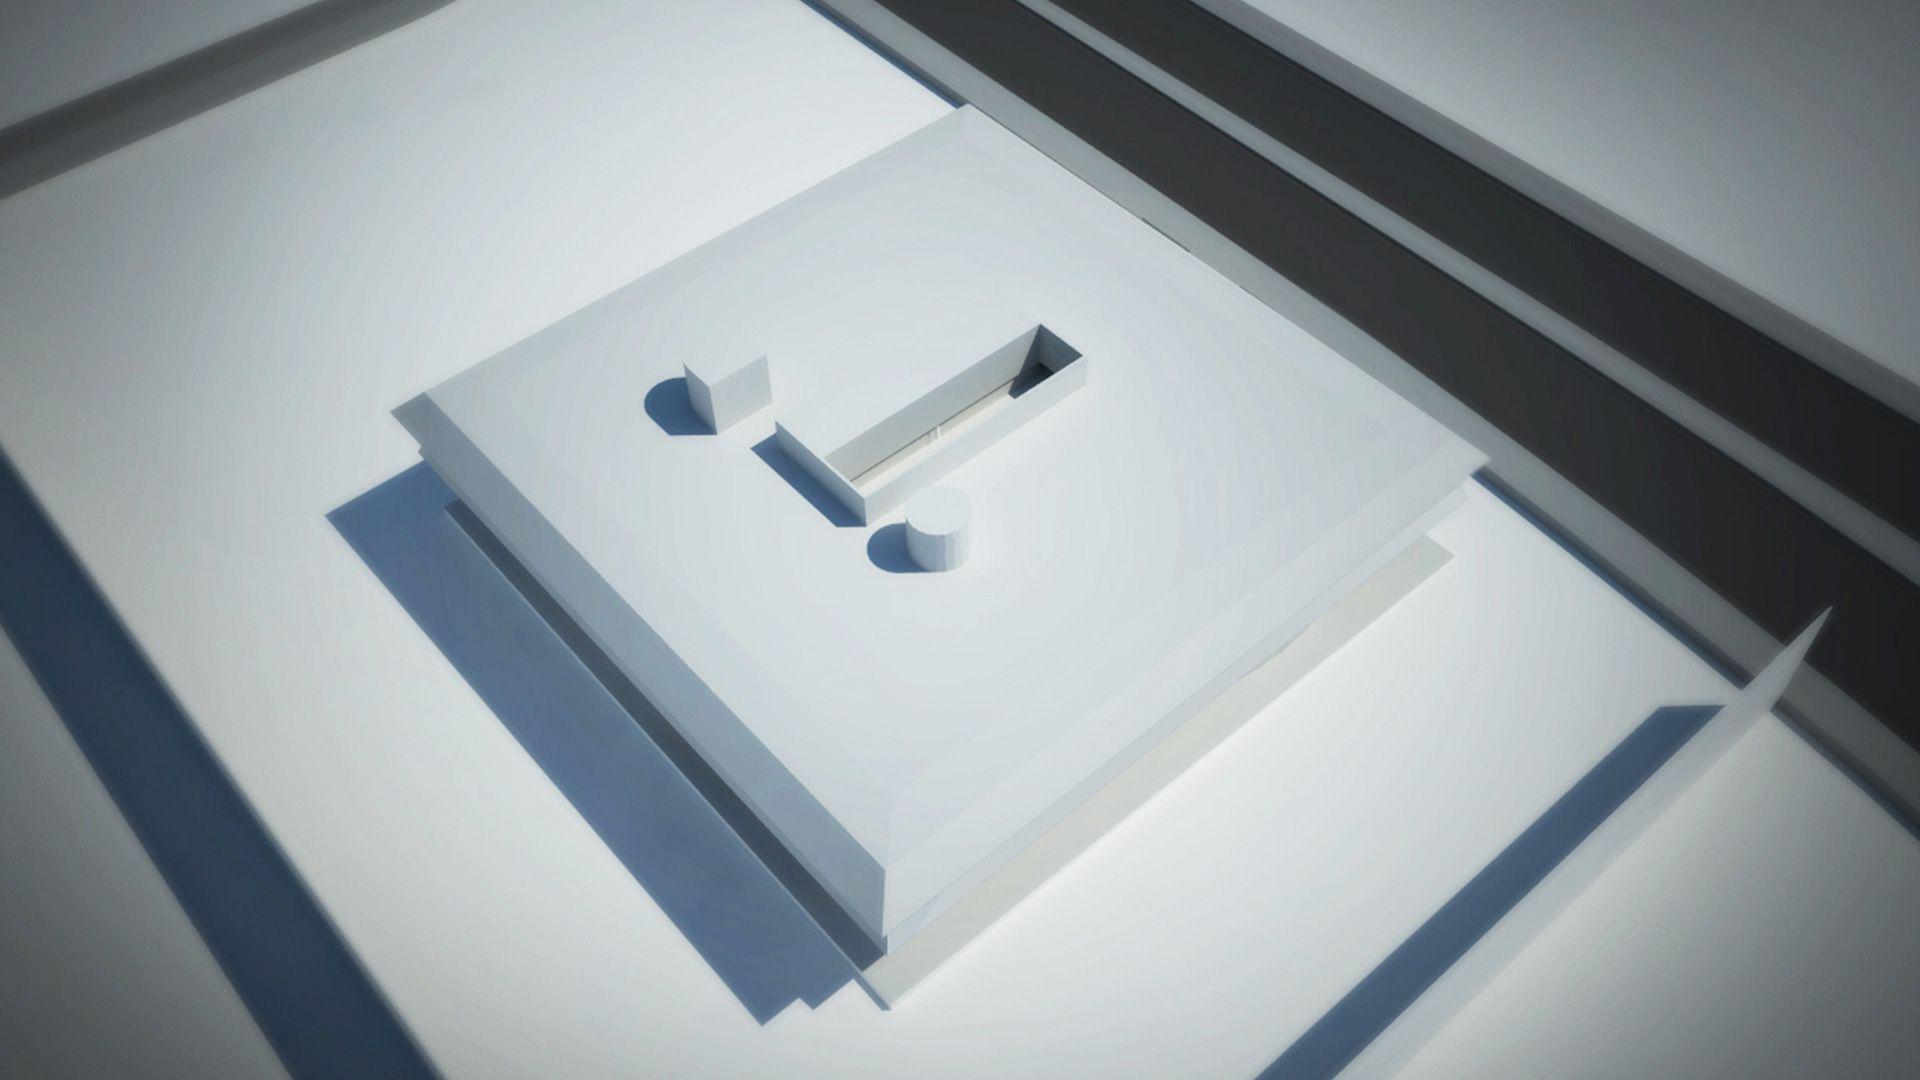 midiateca-santo-andre-render-layout-cobertura-existente